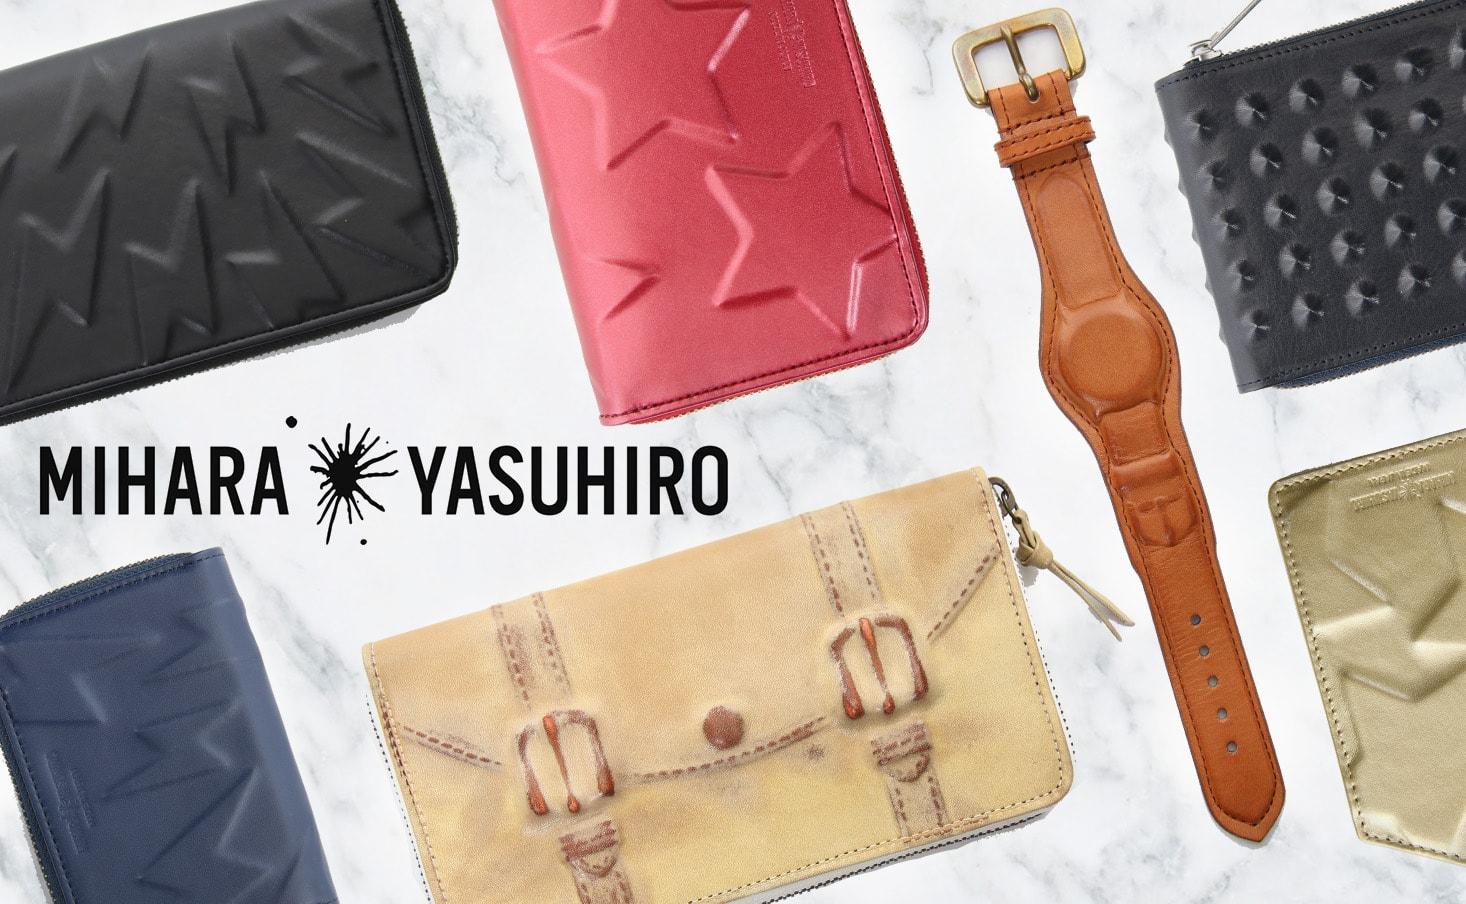 MIHARAYASUHIRO 2019SS collection